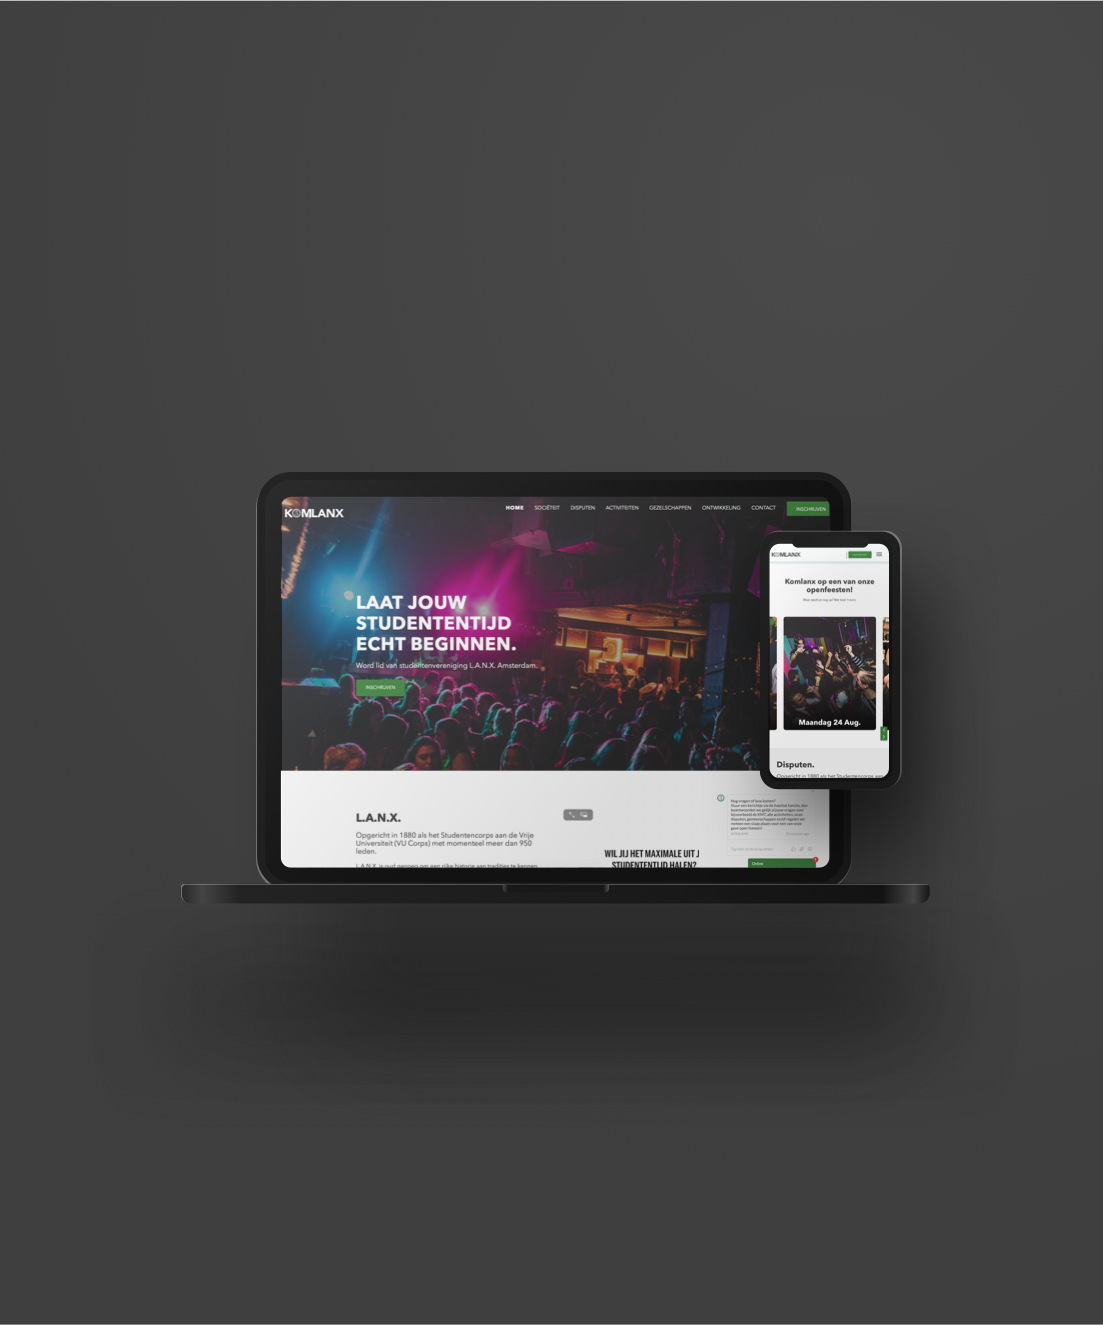 L.A.N.X. - Amsterdam                                                     Rebranding twee websites door SOO Online.